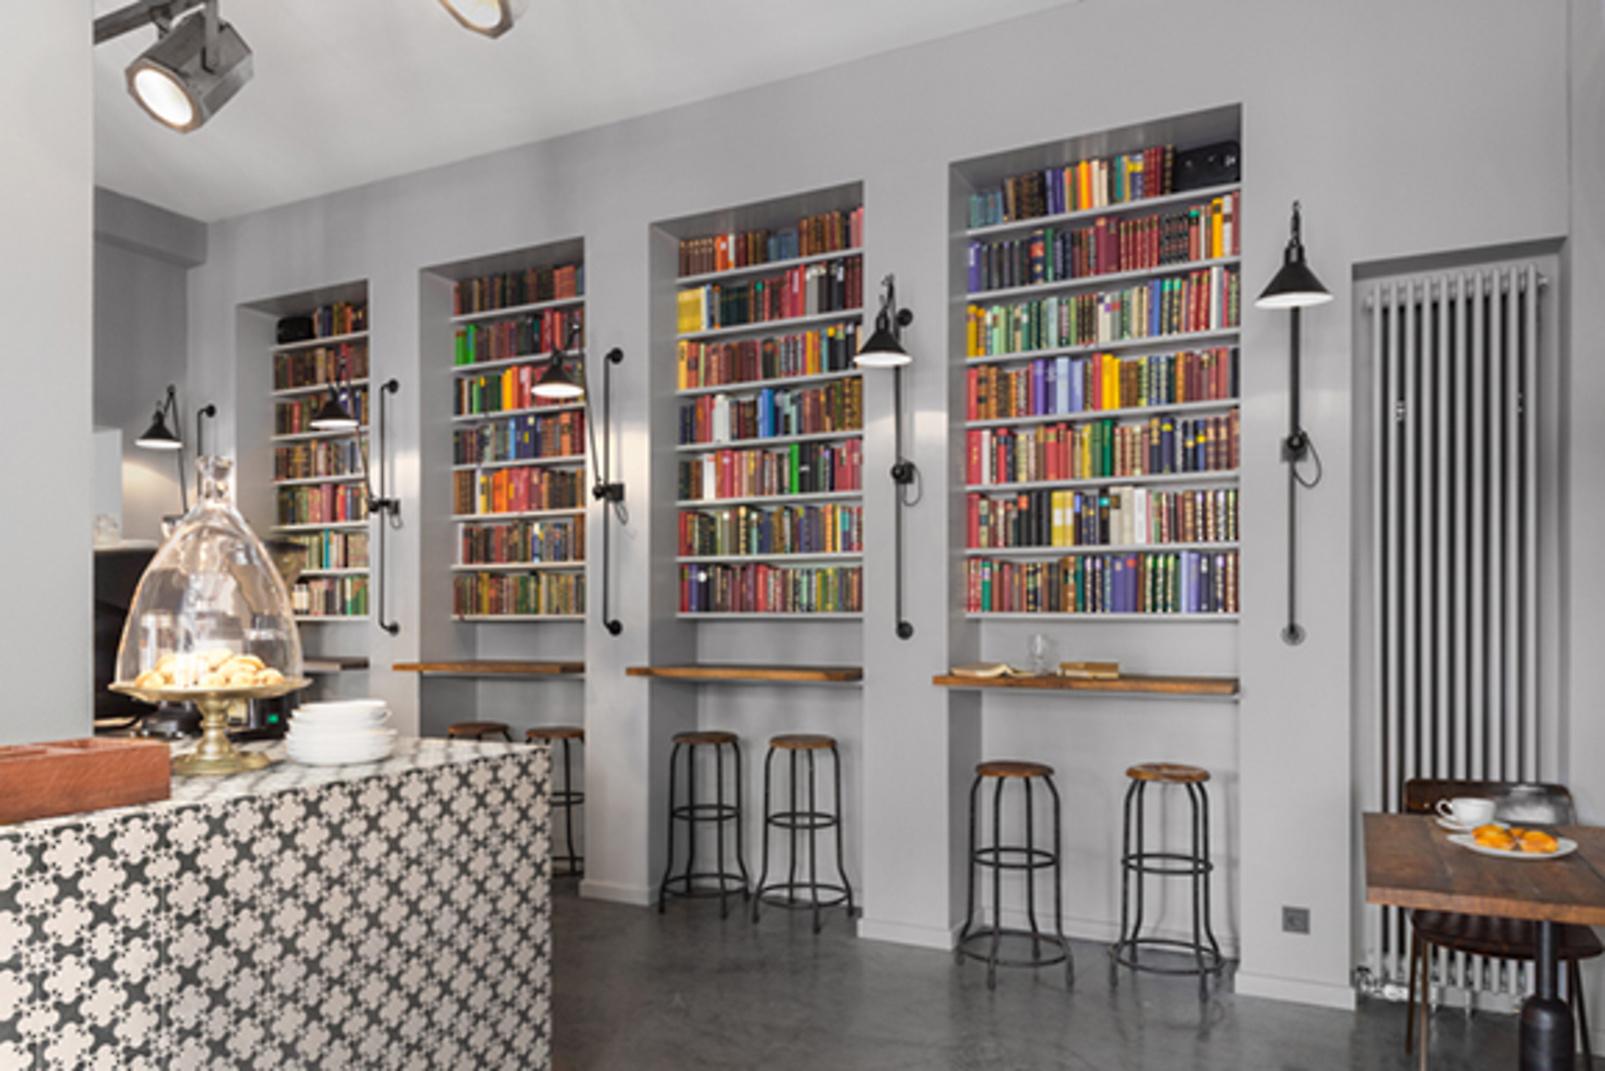 Buchhandlung wird Cocktailbar: Caparol